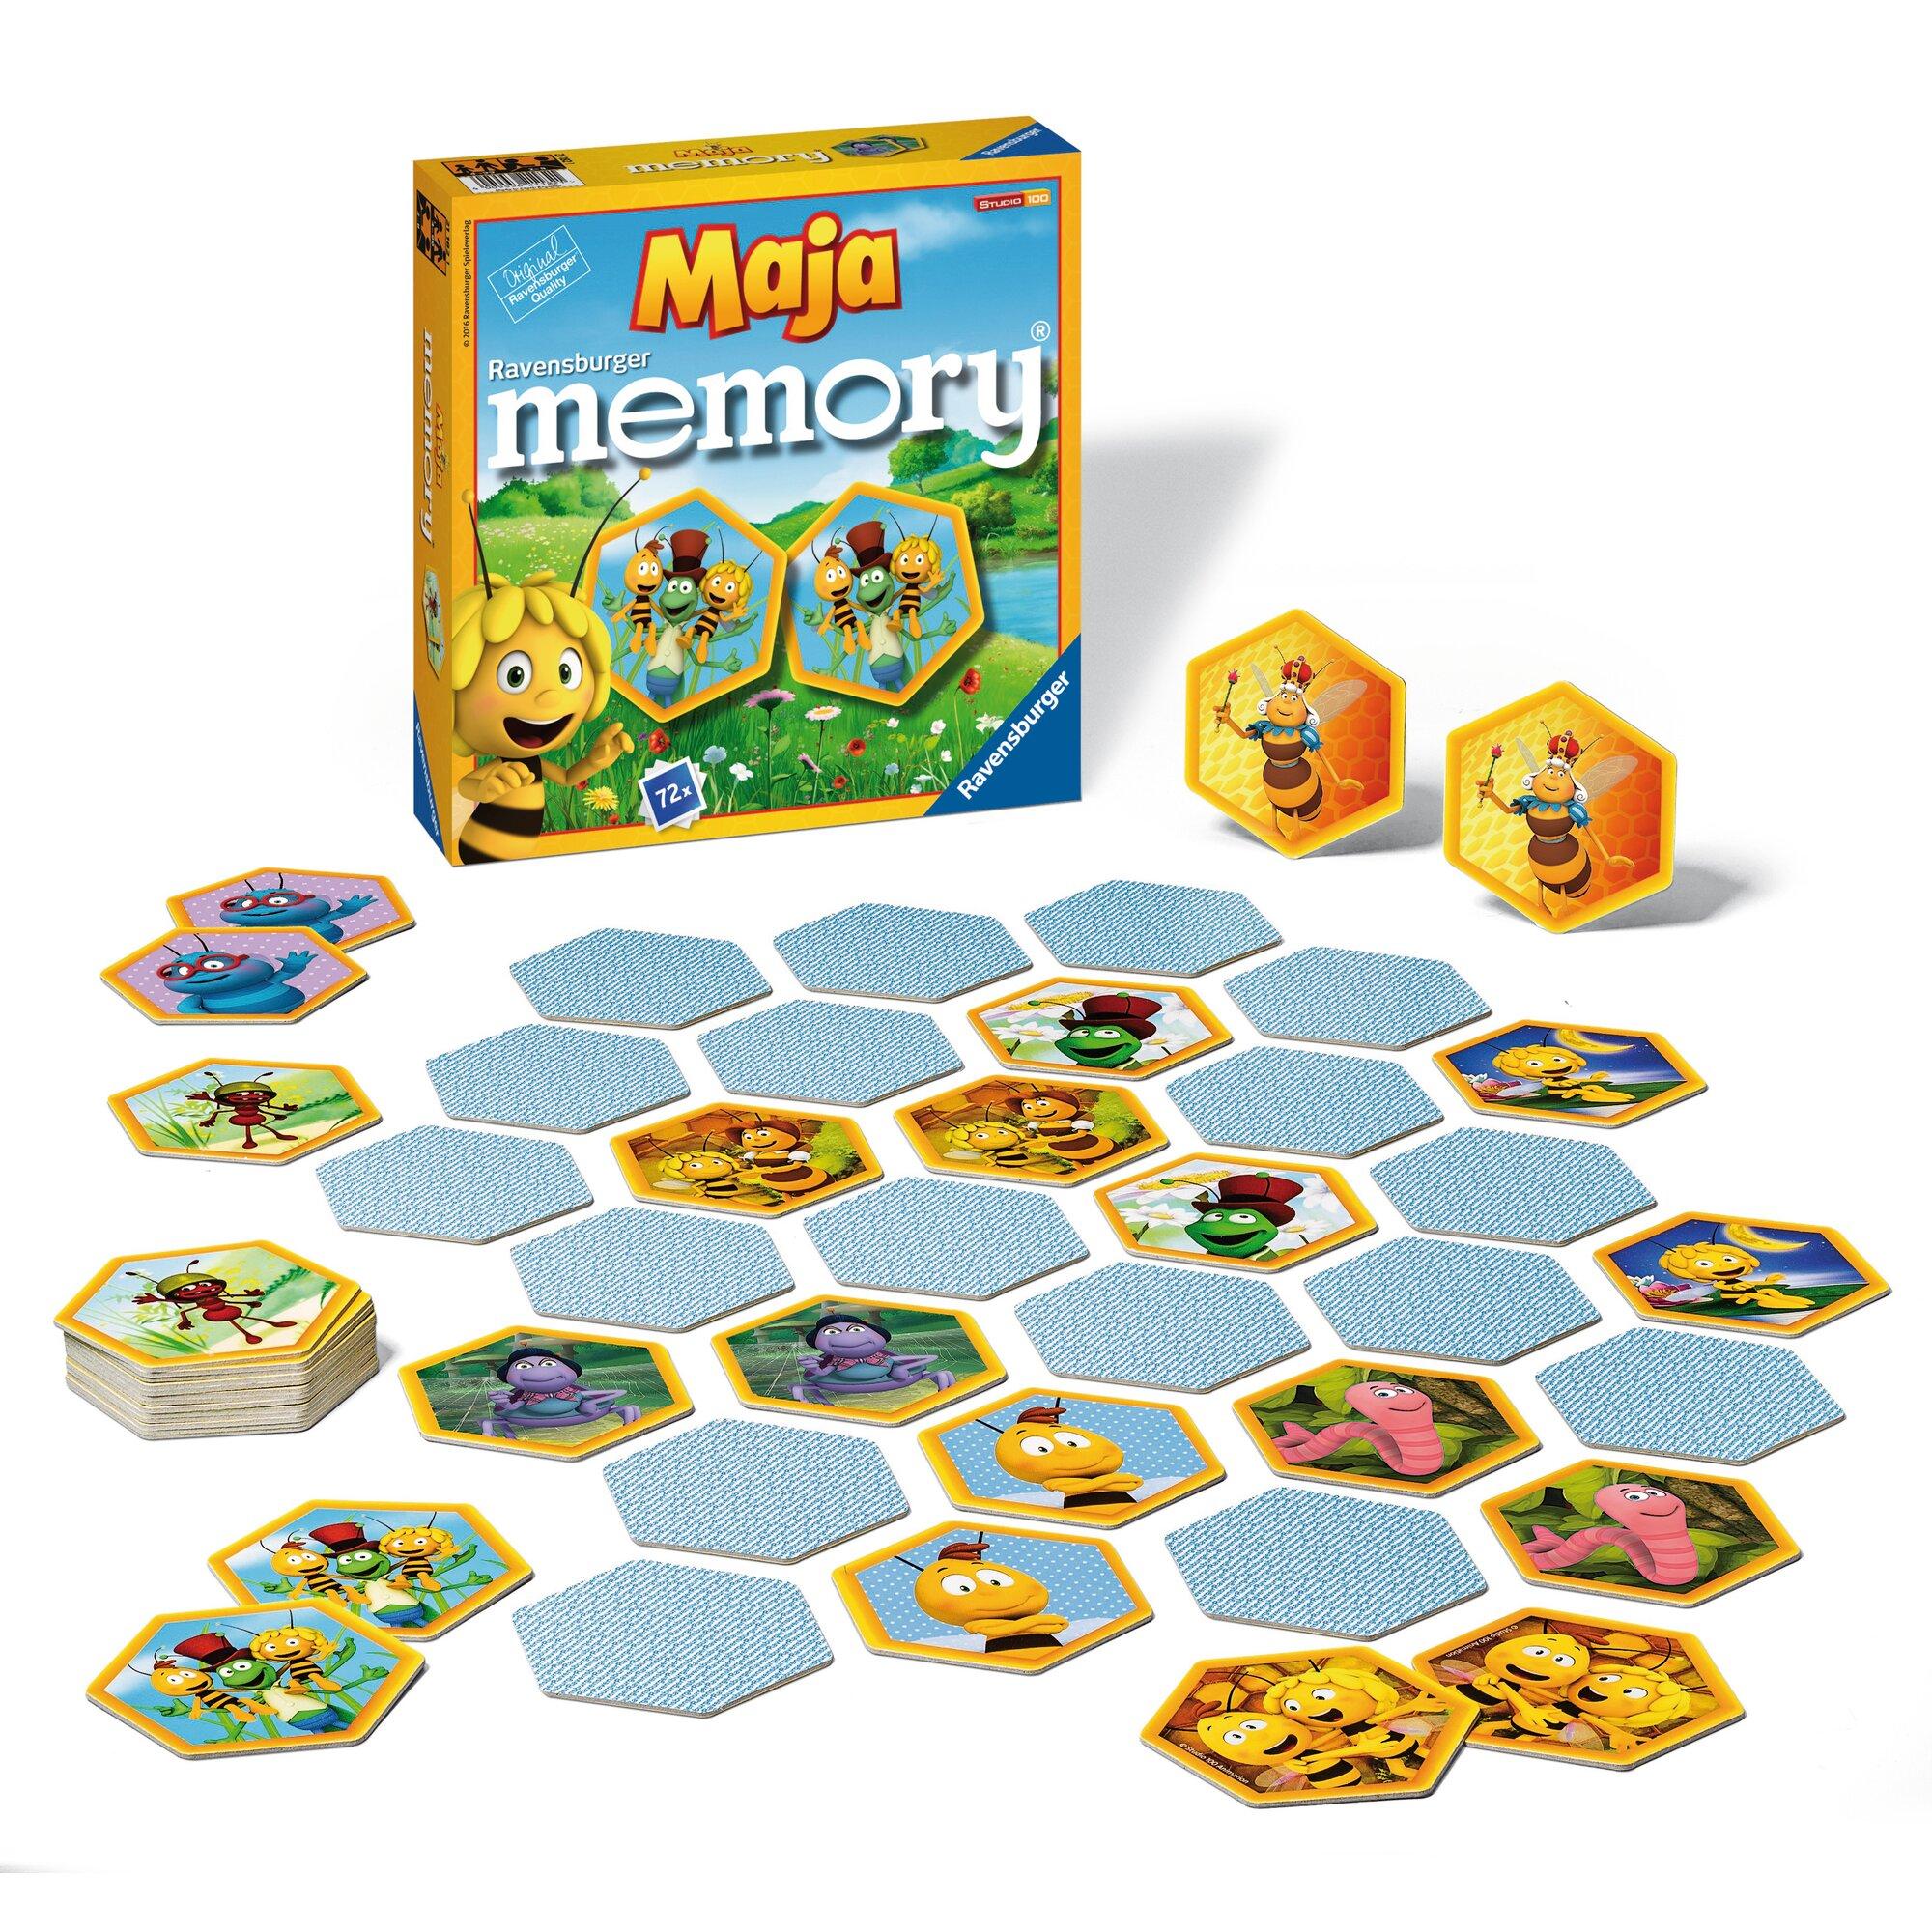 ravensburger-biene-maja-memory-legekartenspiel